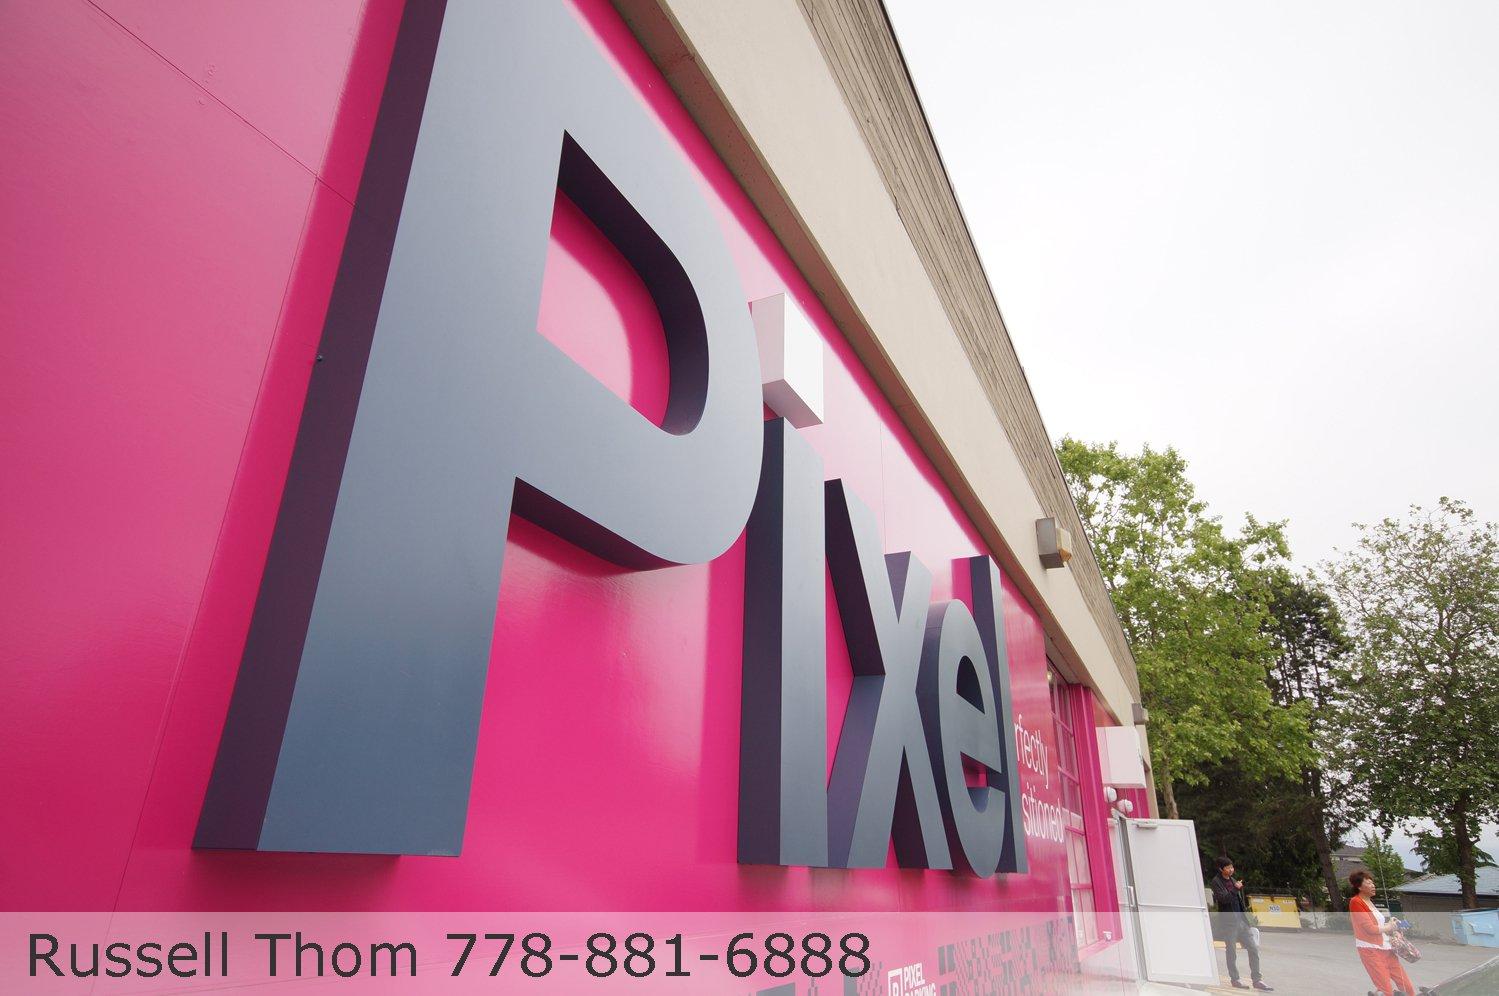 Main Photo: PIXEL 6283 Kingsway St Burnaby BC